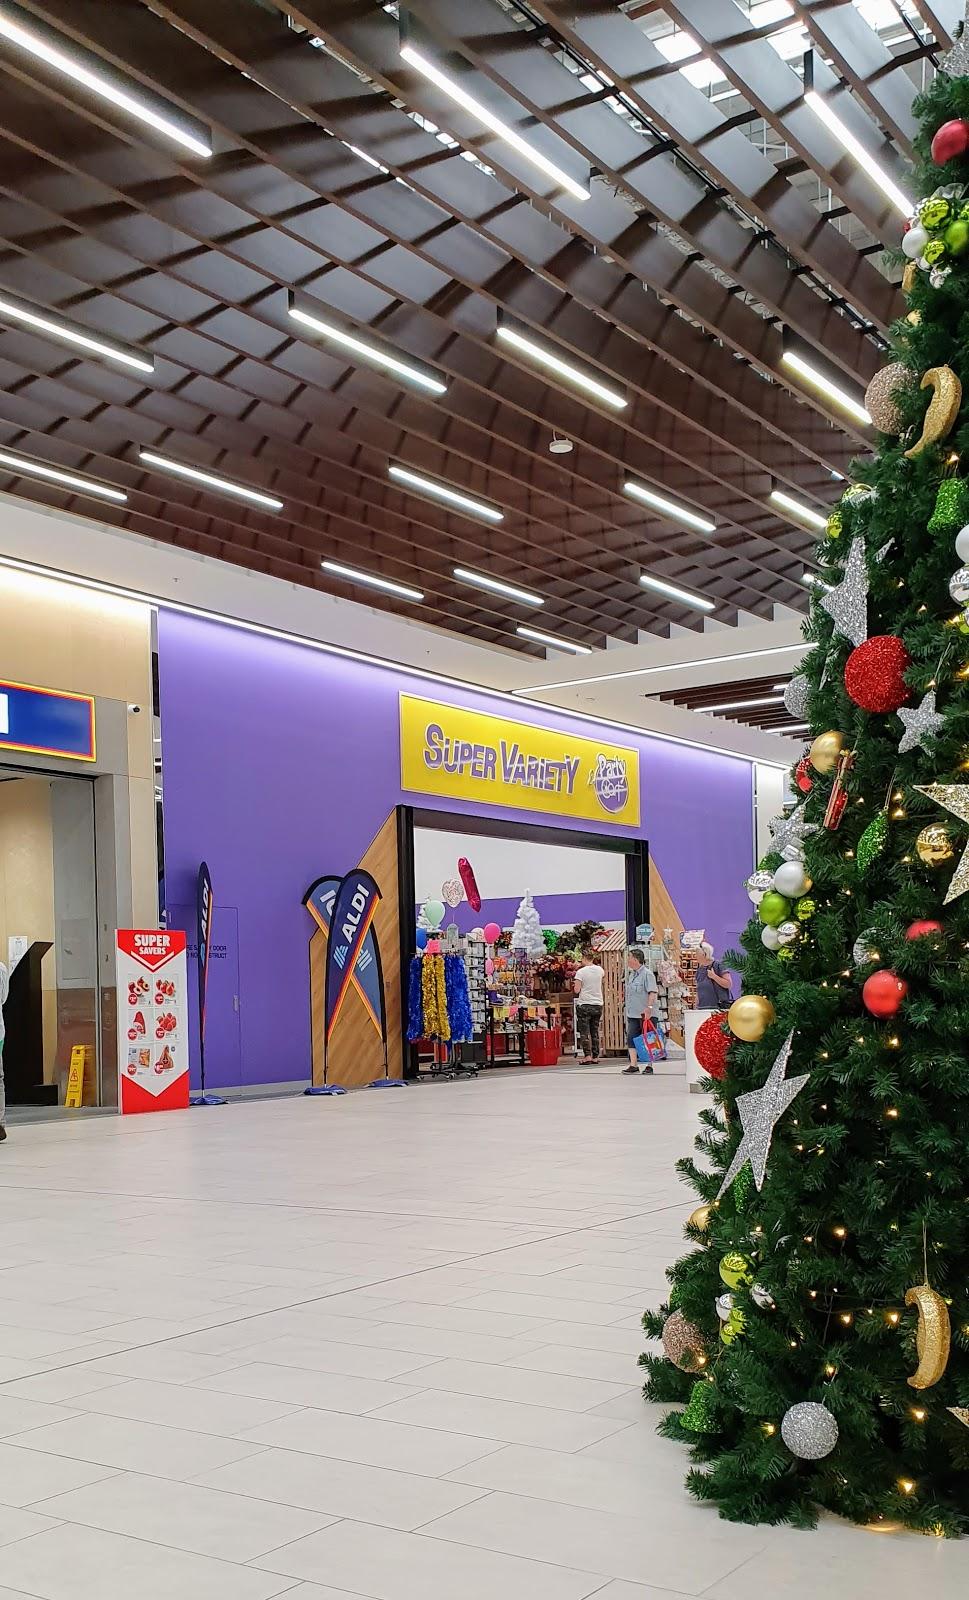 Super Variety & Party Cart Keysborough | home goods store | 466-468 Cheltenham Rd, Keysborough VIC 3173, Australia